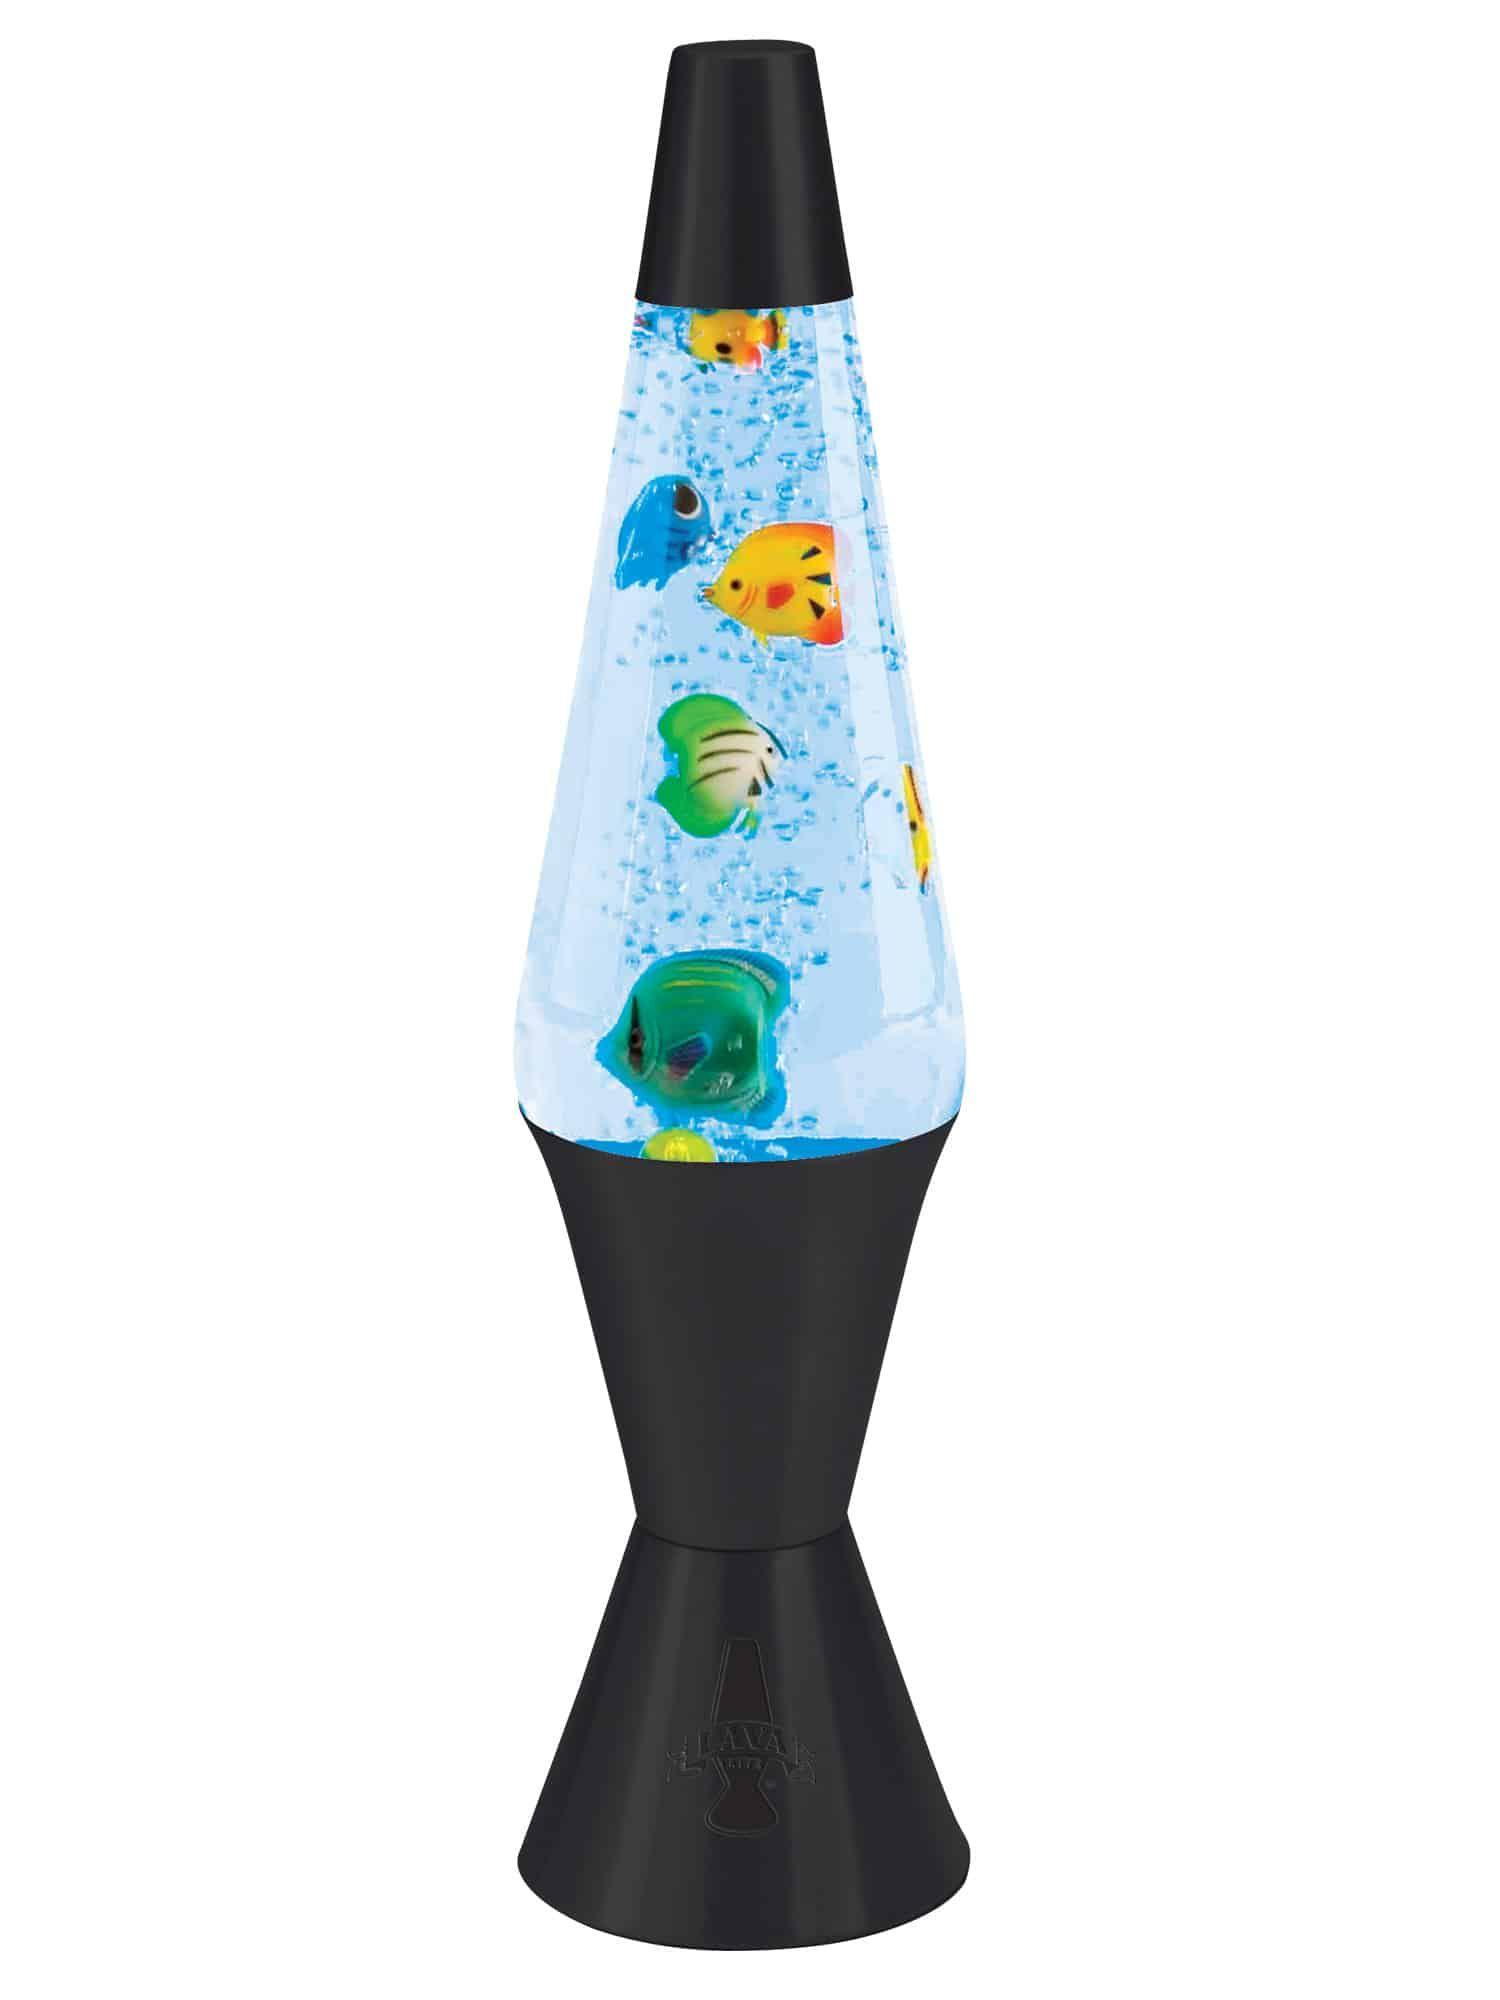 Lava Lamps Walmart Pinholiday Planner On Sort Later  Pinterest  Aquarium Lamp